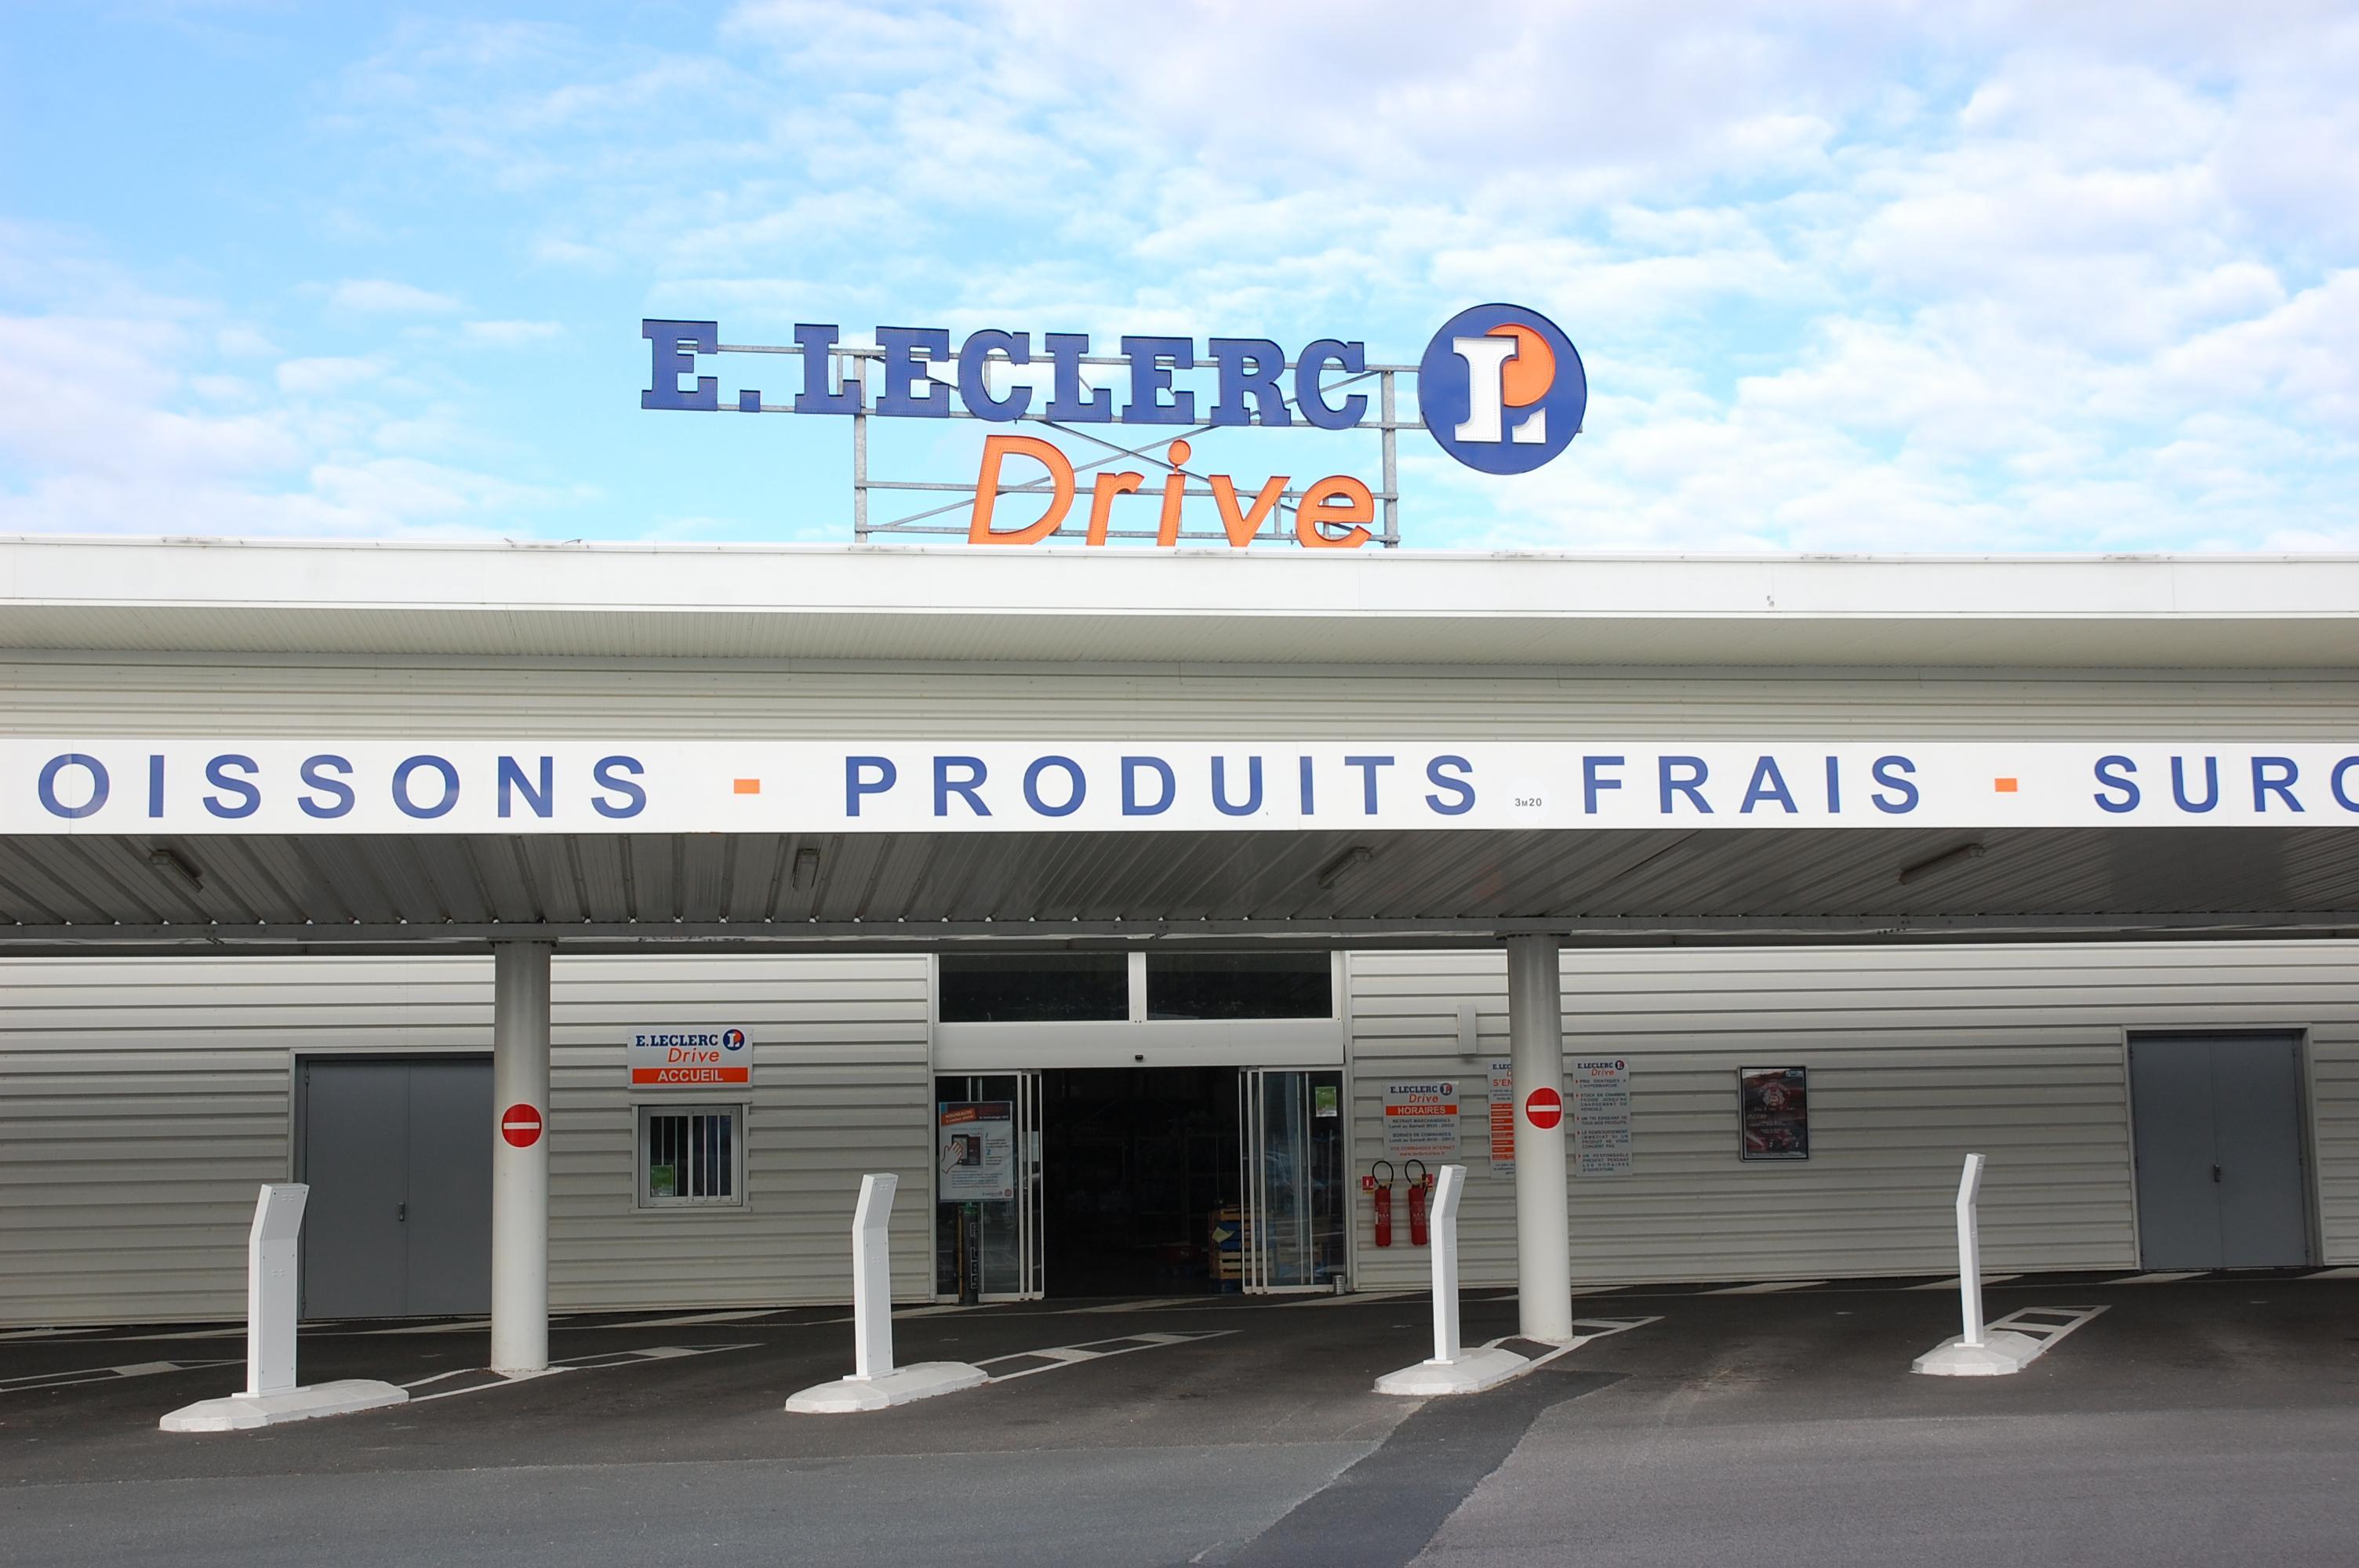 E.leclerc Drive Basse Goulaine / Nantes Basse Goulaine